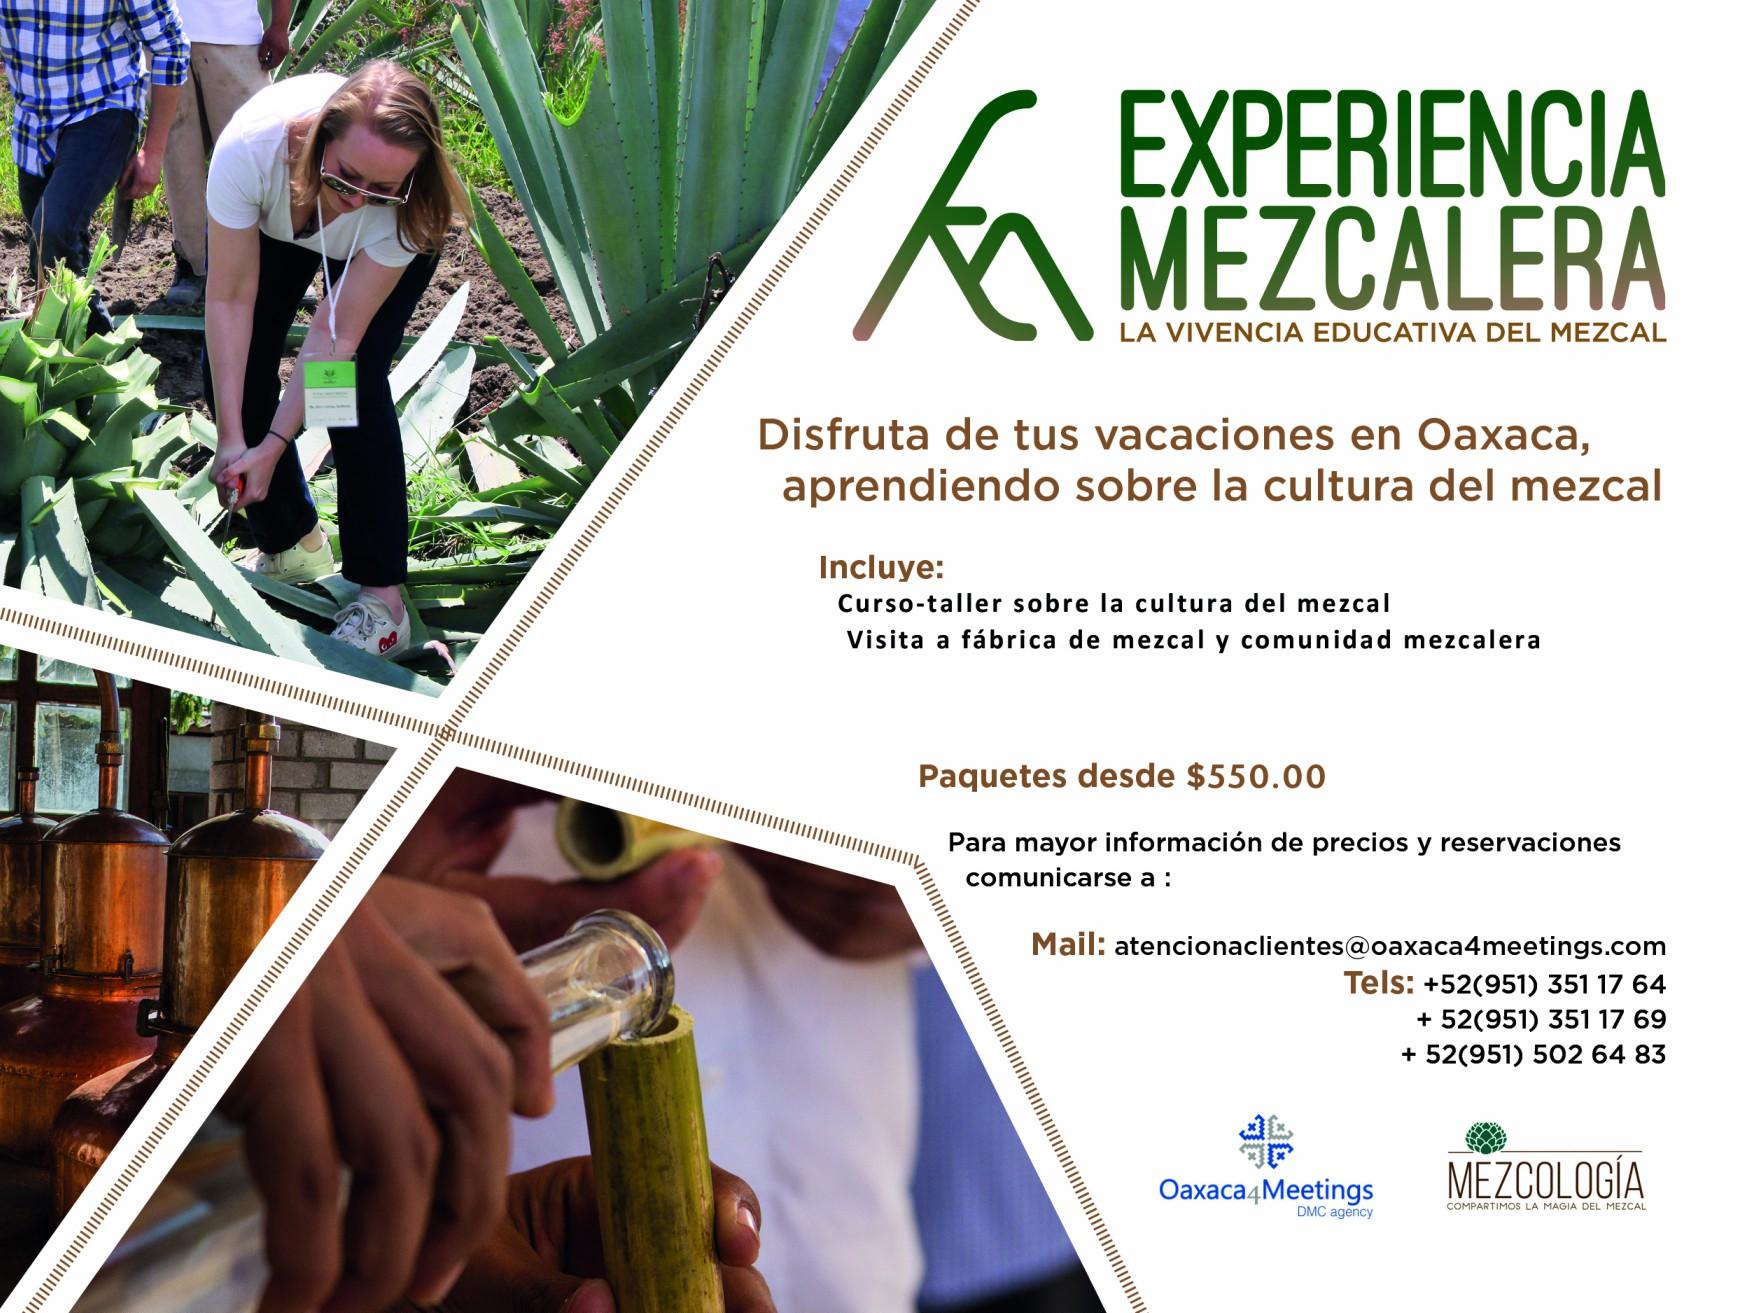 Experiencia Mezcalera